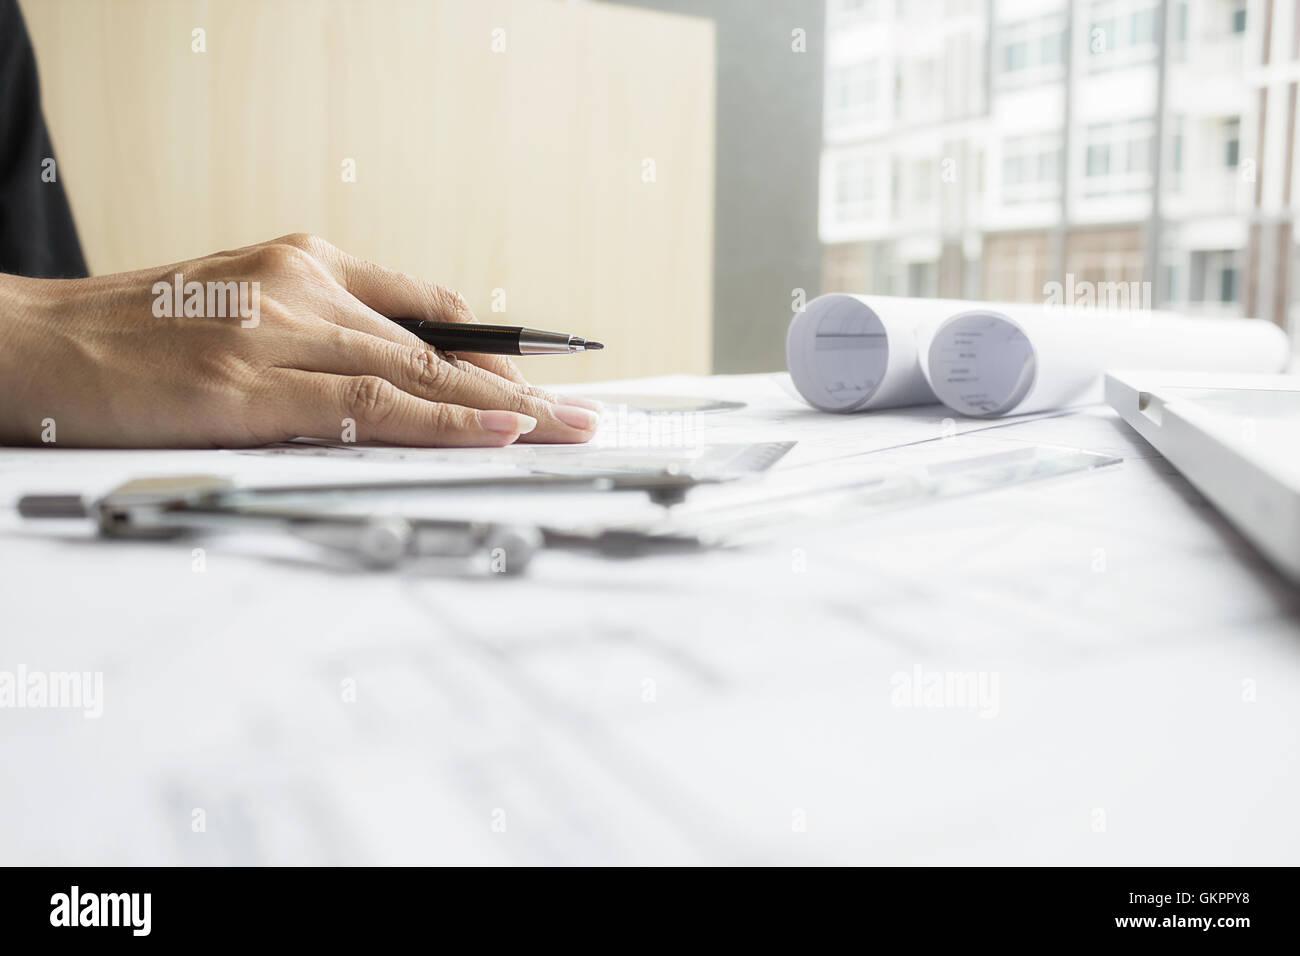 Engineer project working engineering tools workplace document engineer project working engineering tools workplace document architectural blueprint paperwork interaction holding malvernweather Gallery